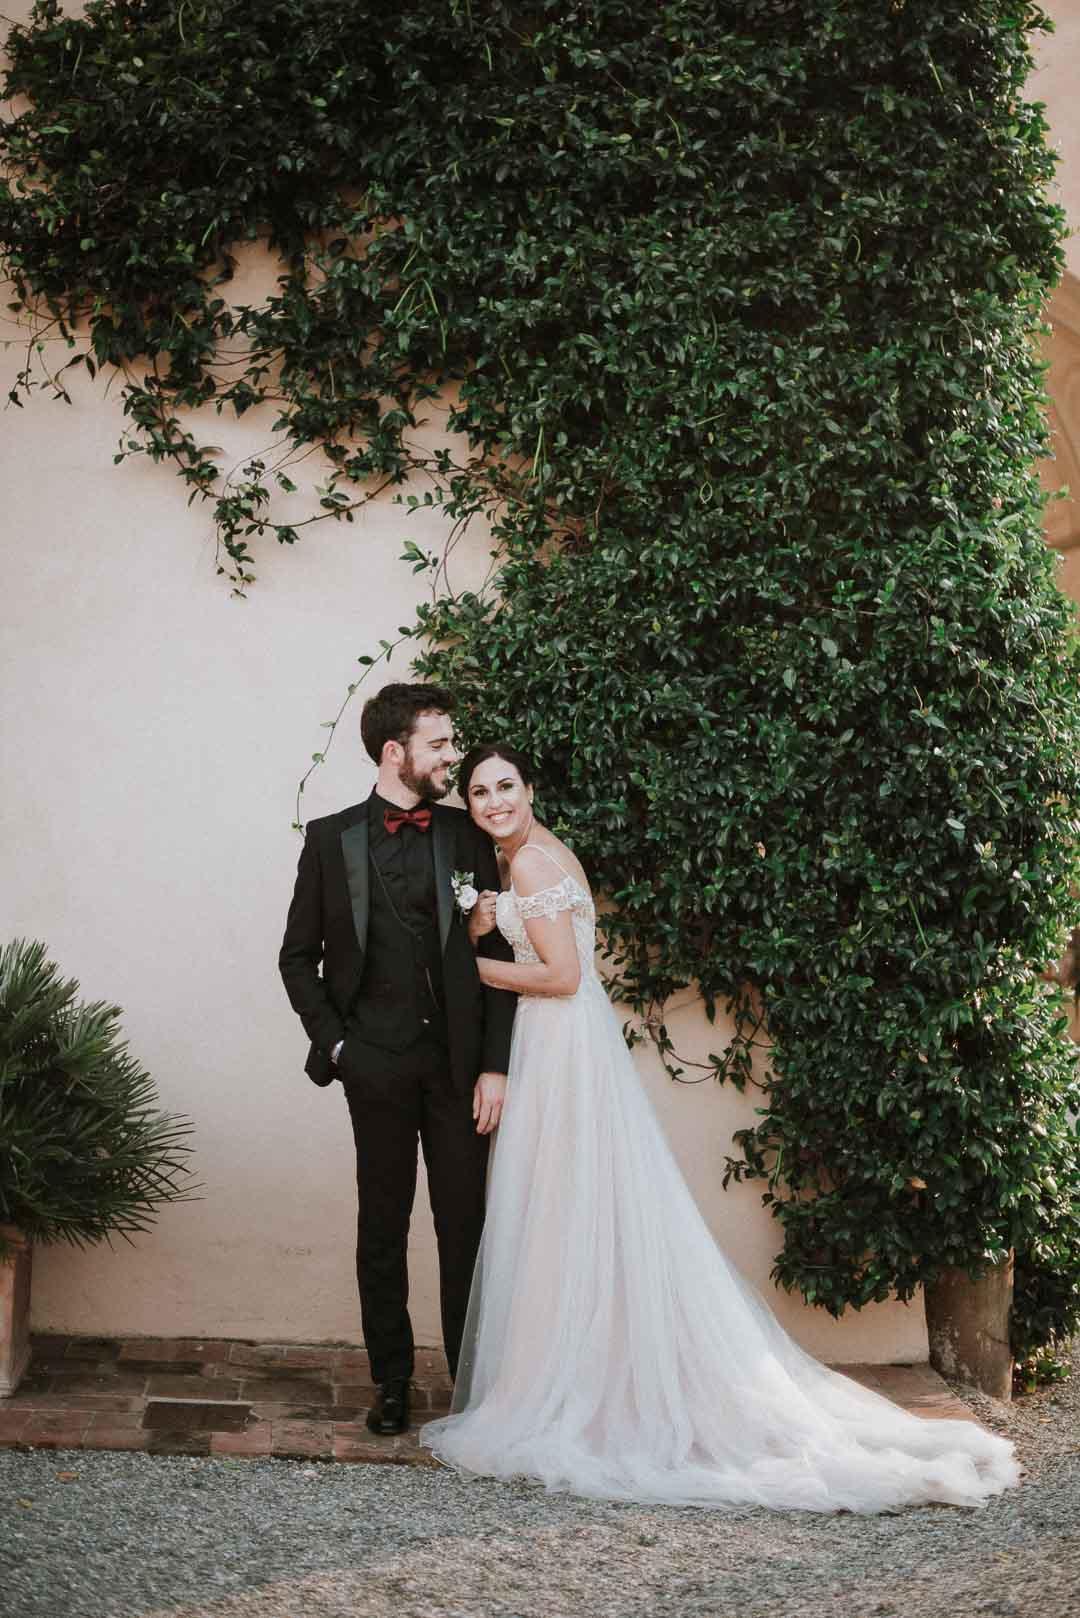 wedding-photographer-destination-fineart-bespoke-reportage-tuscany-villascorzi-vivianeizzo-spazio46-104